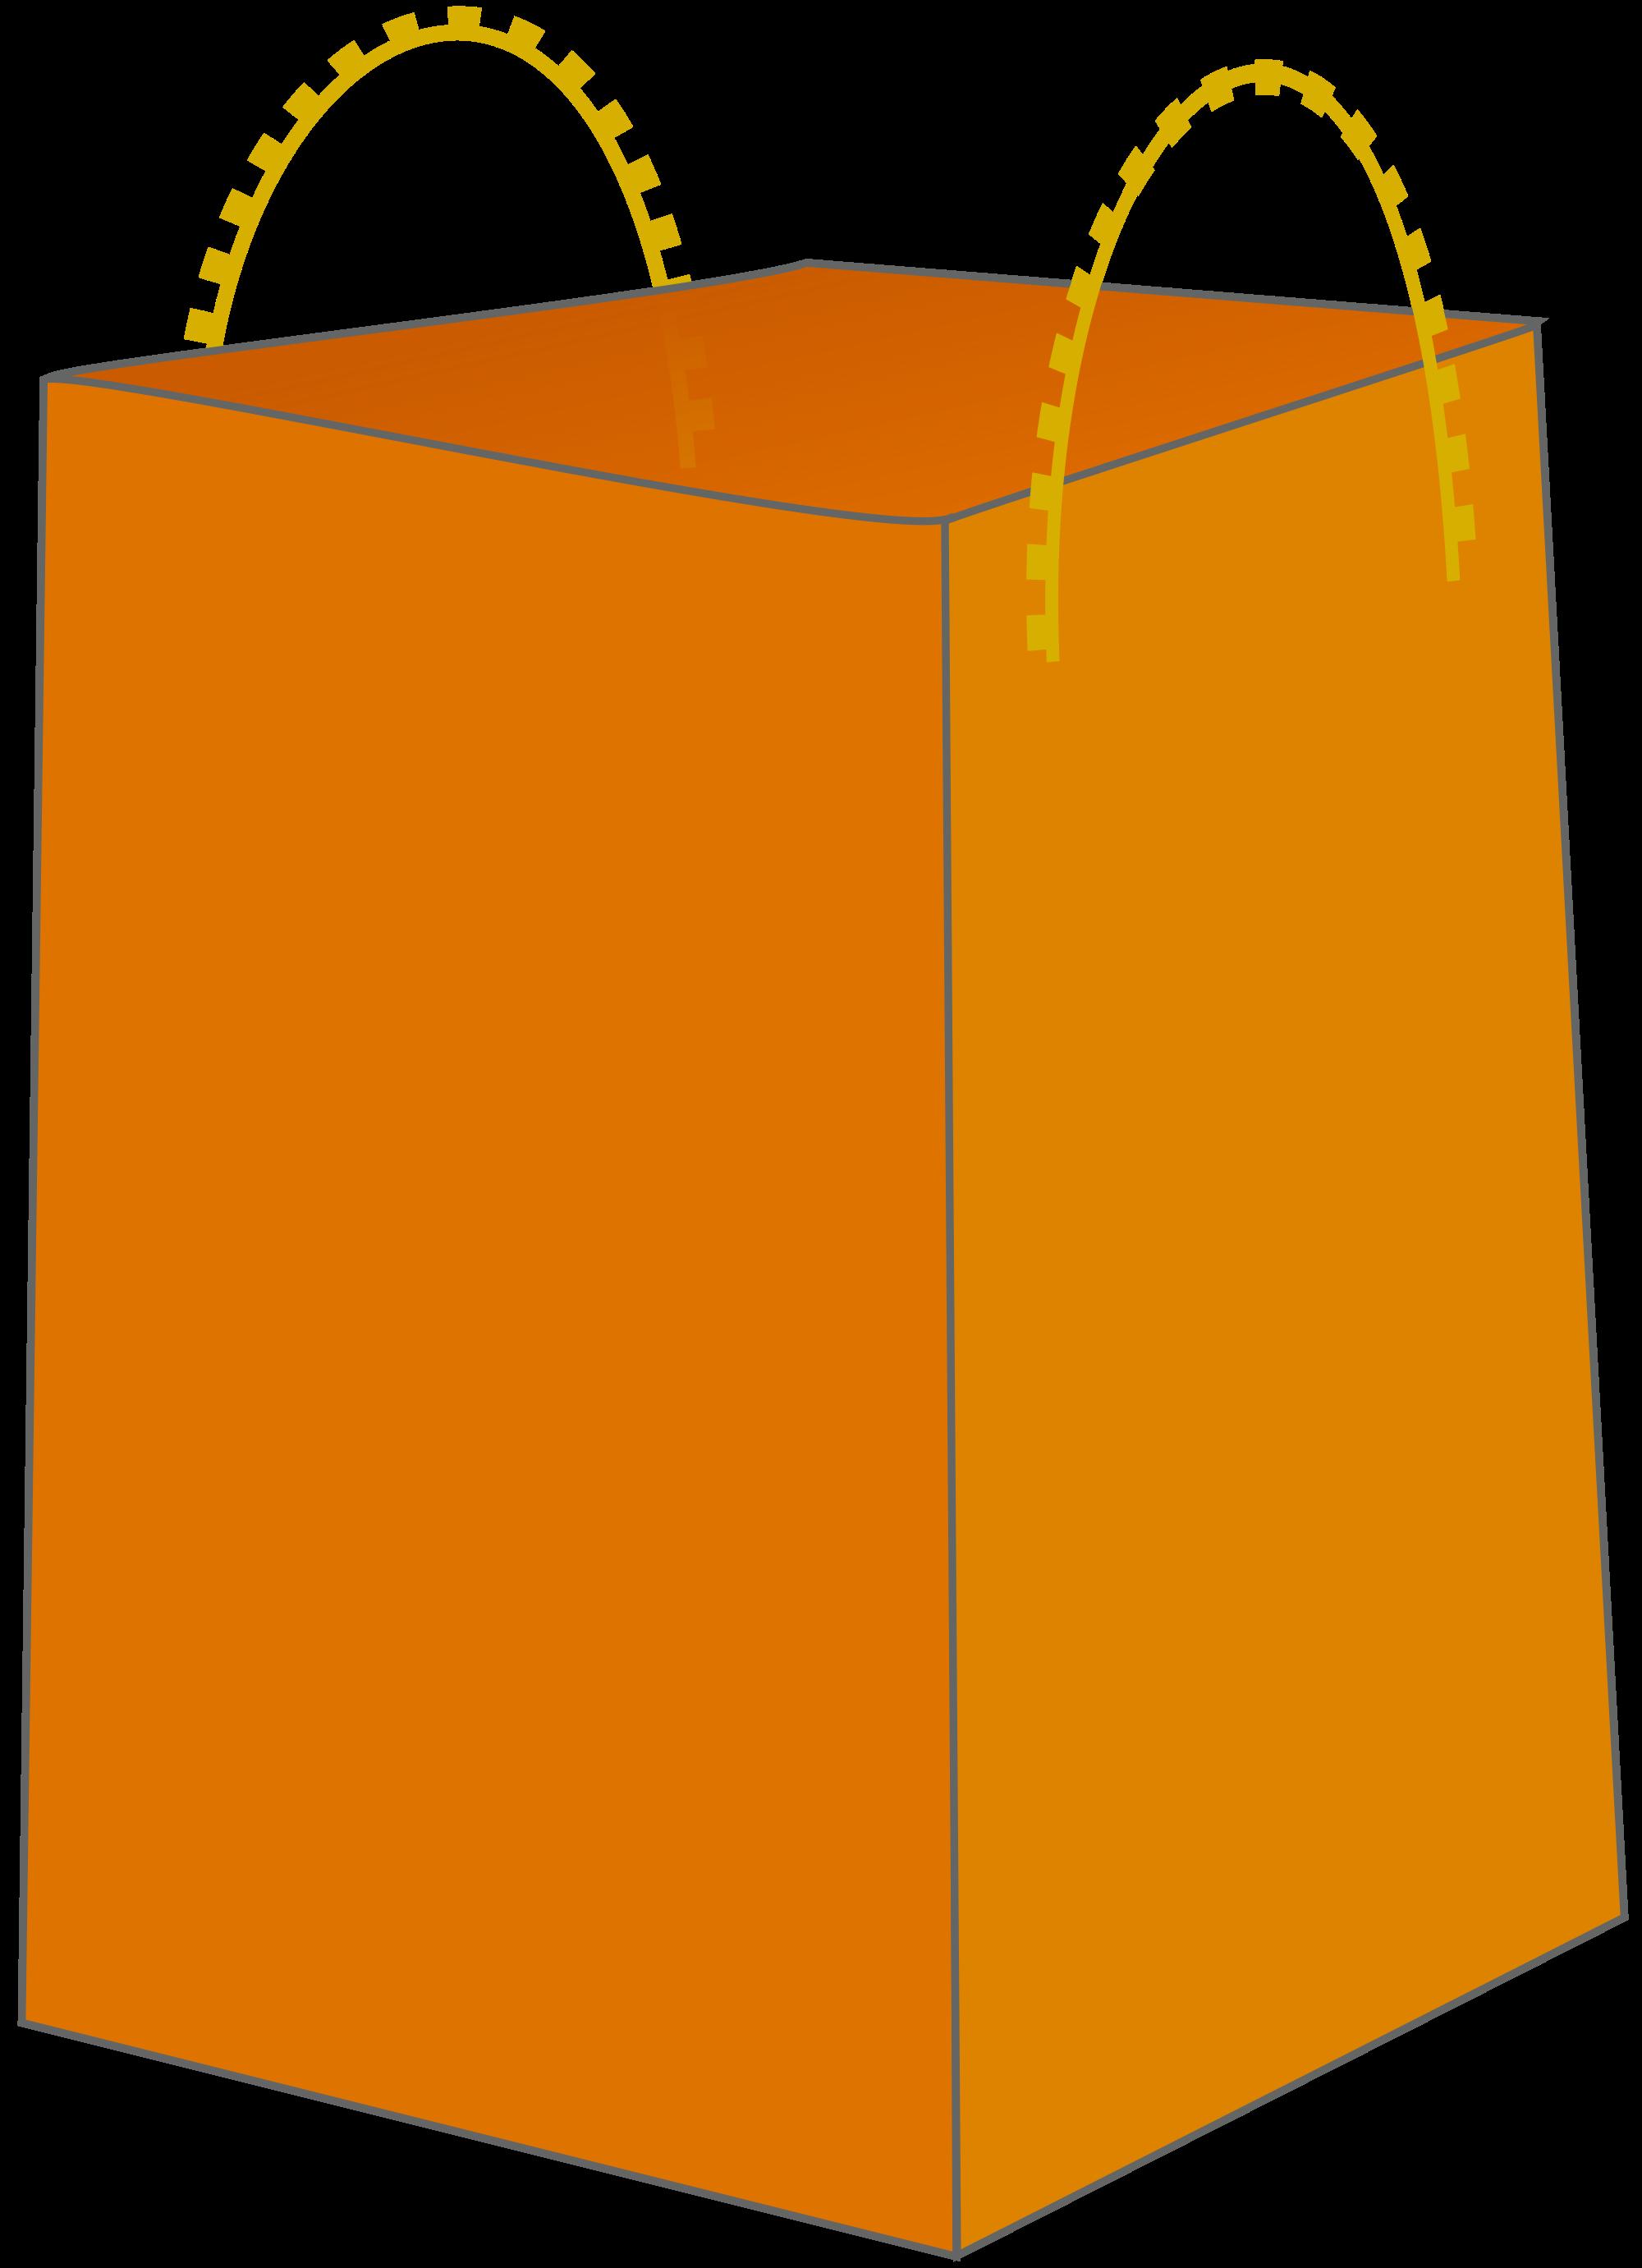 File shopping svg wikimedia. Wallet clipart orange bag